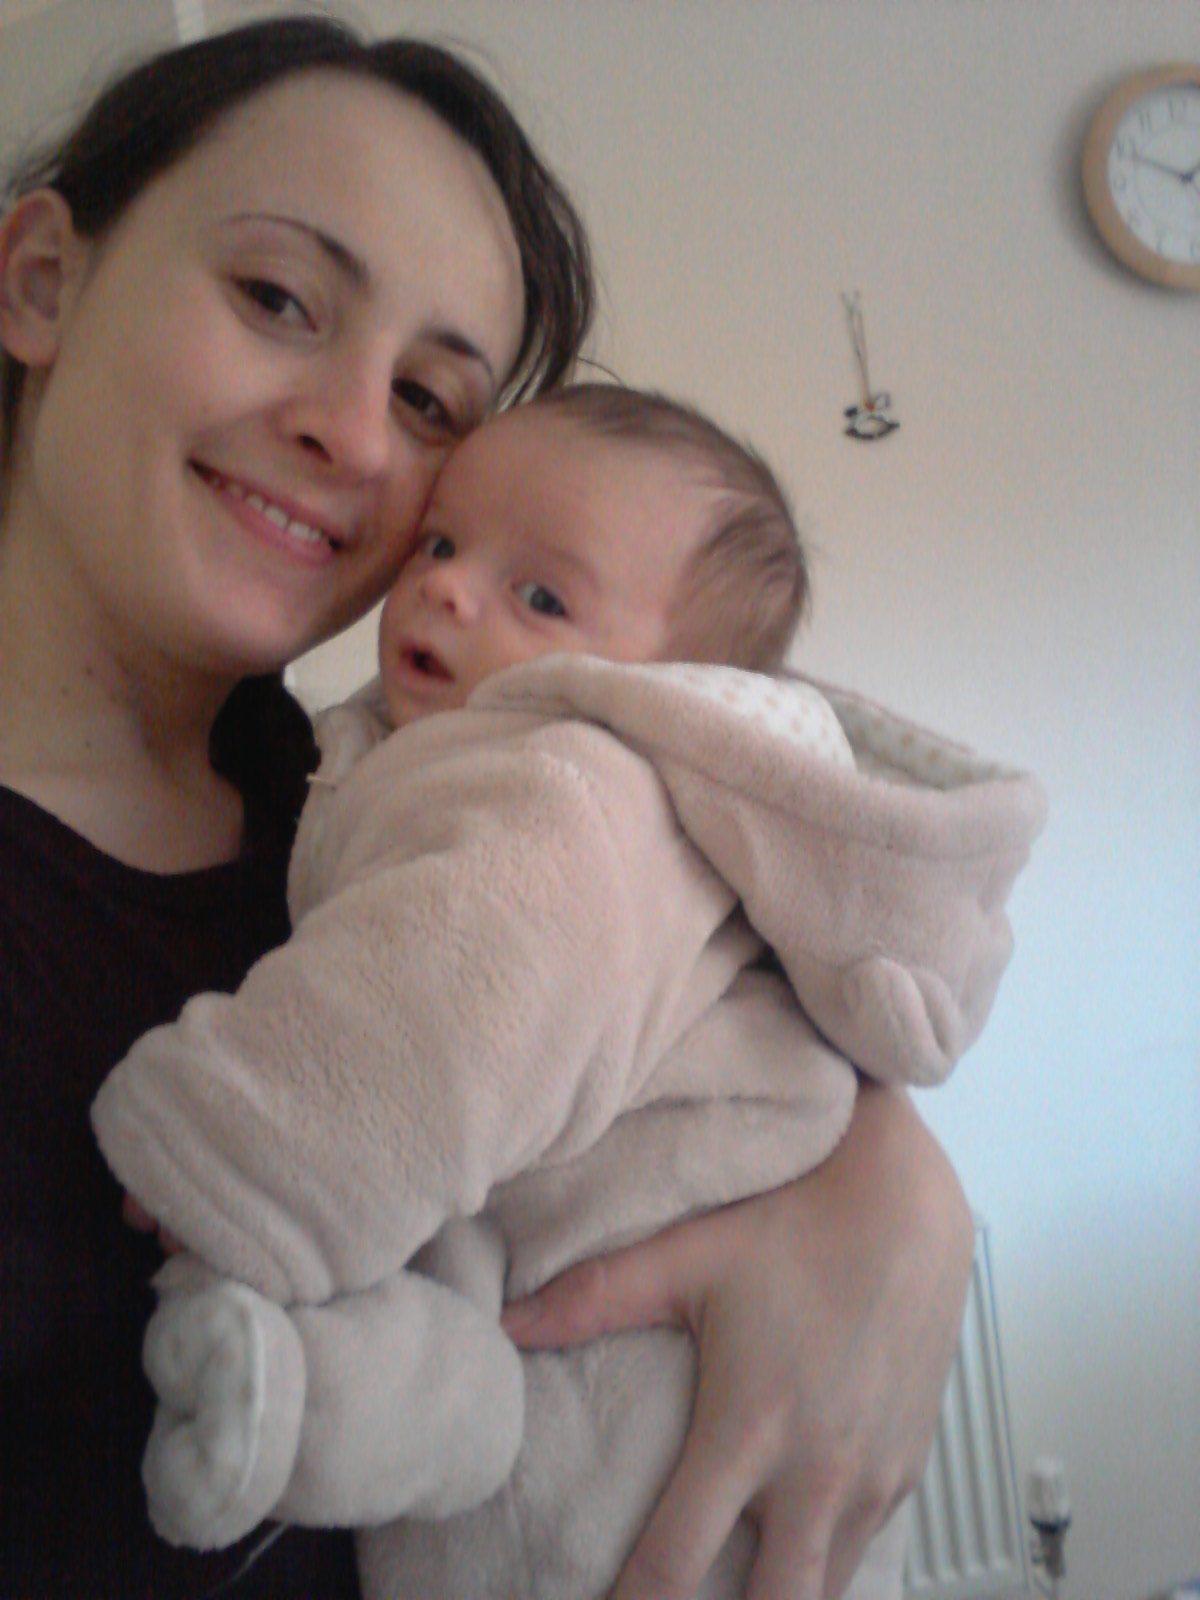 Reflux in infants: A mother's instinct...